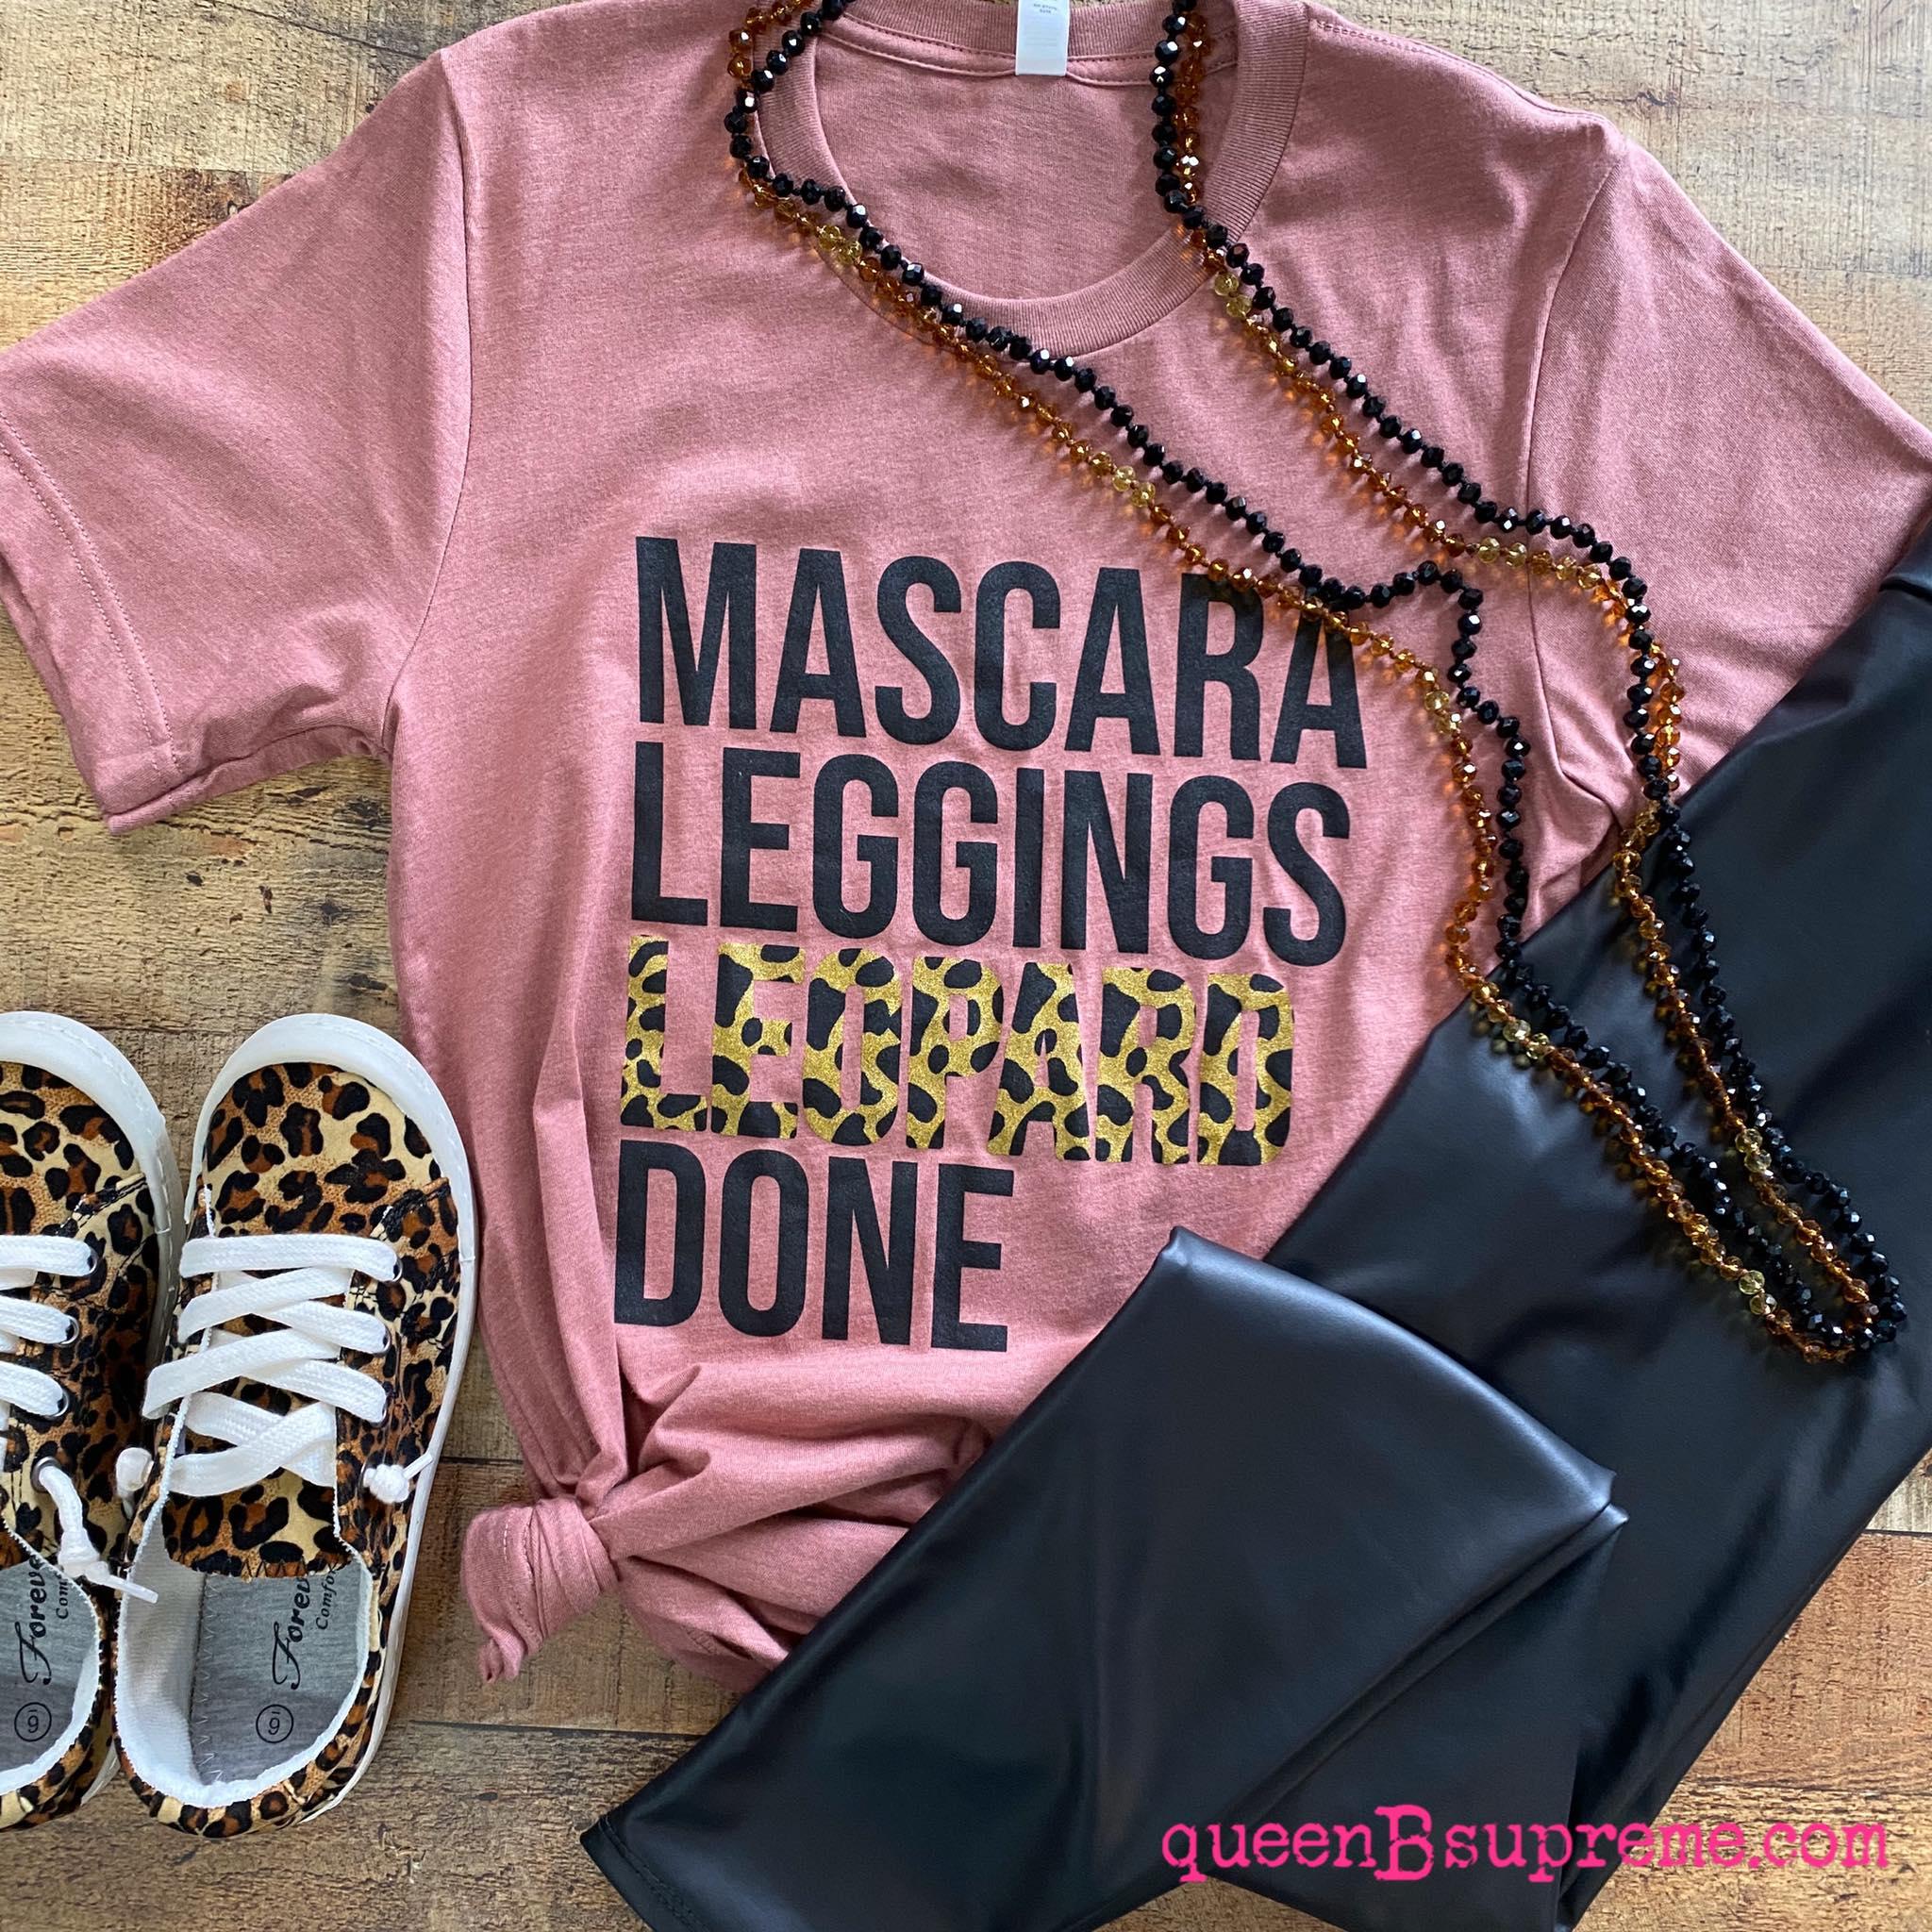 Mascara leggings leopard done shirt